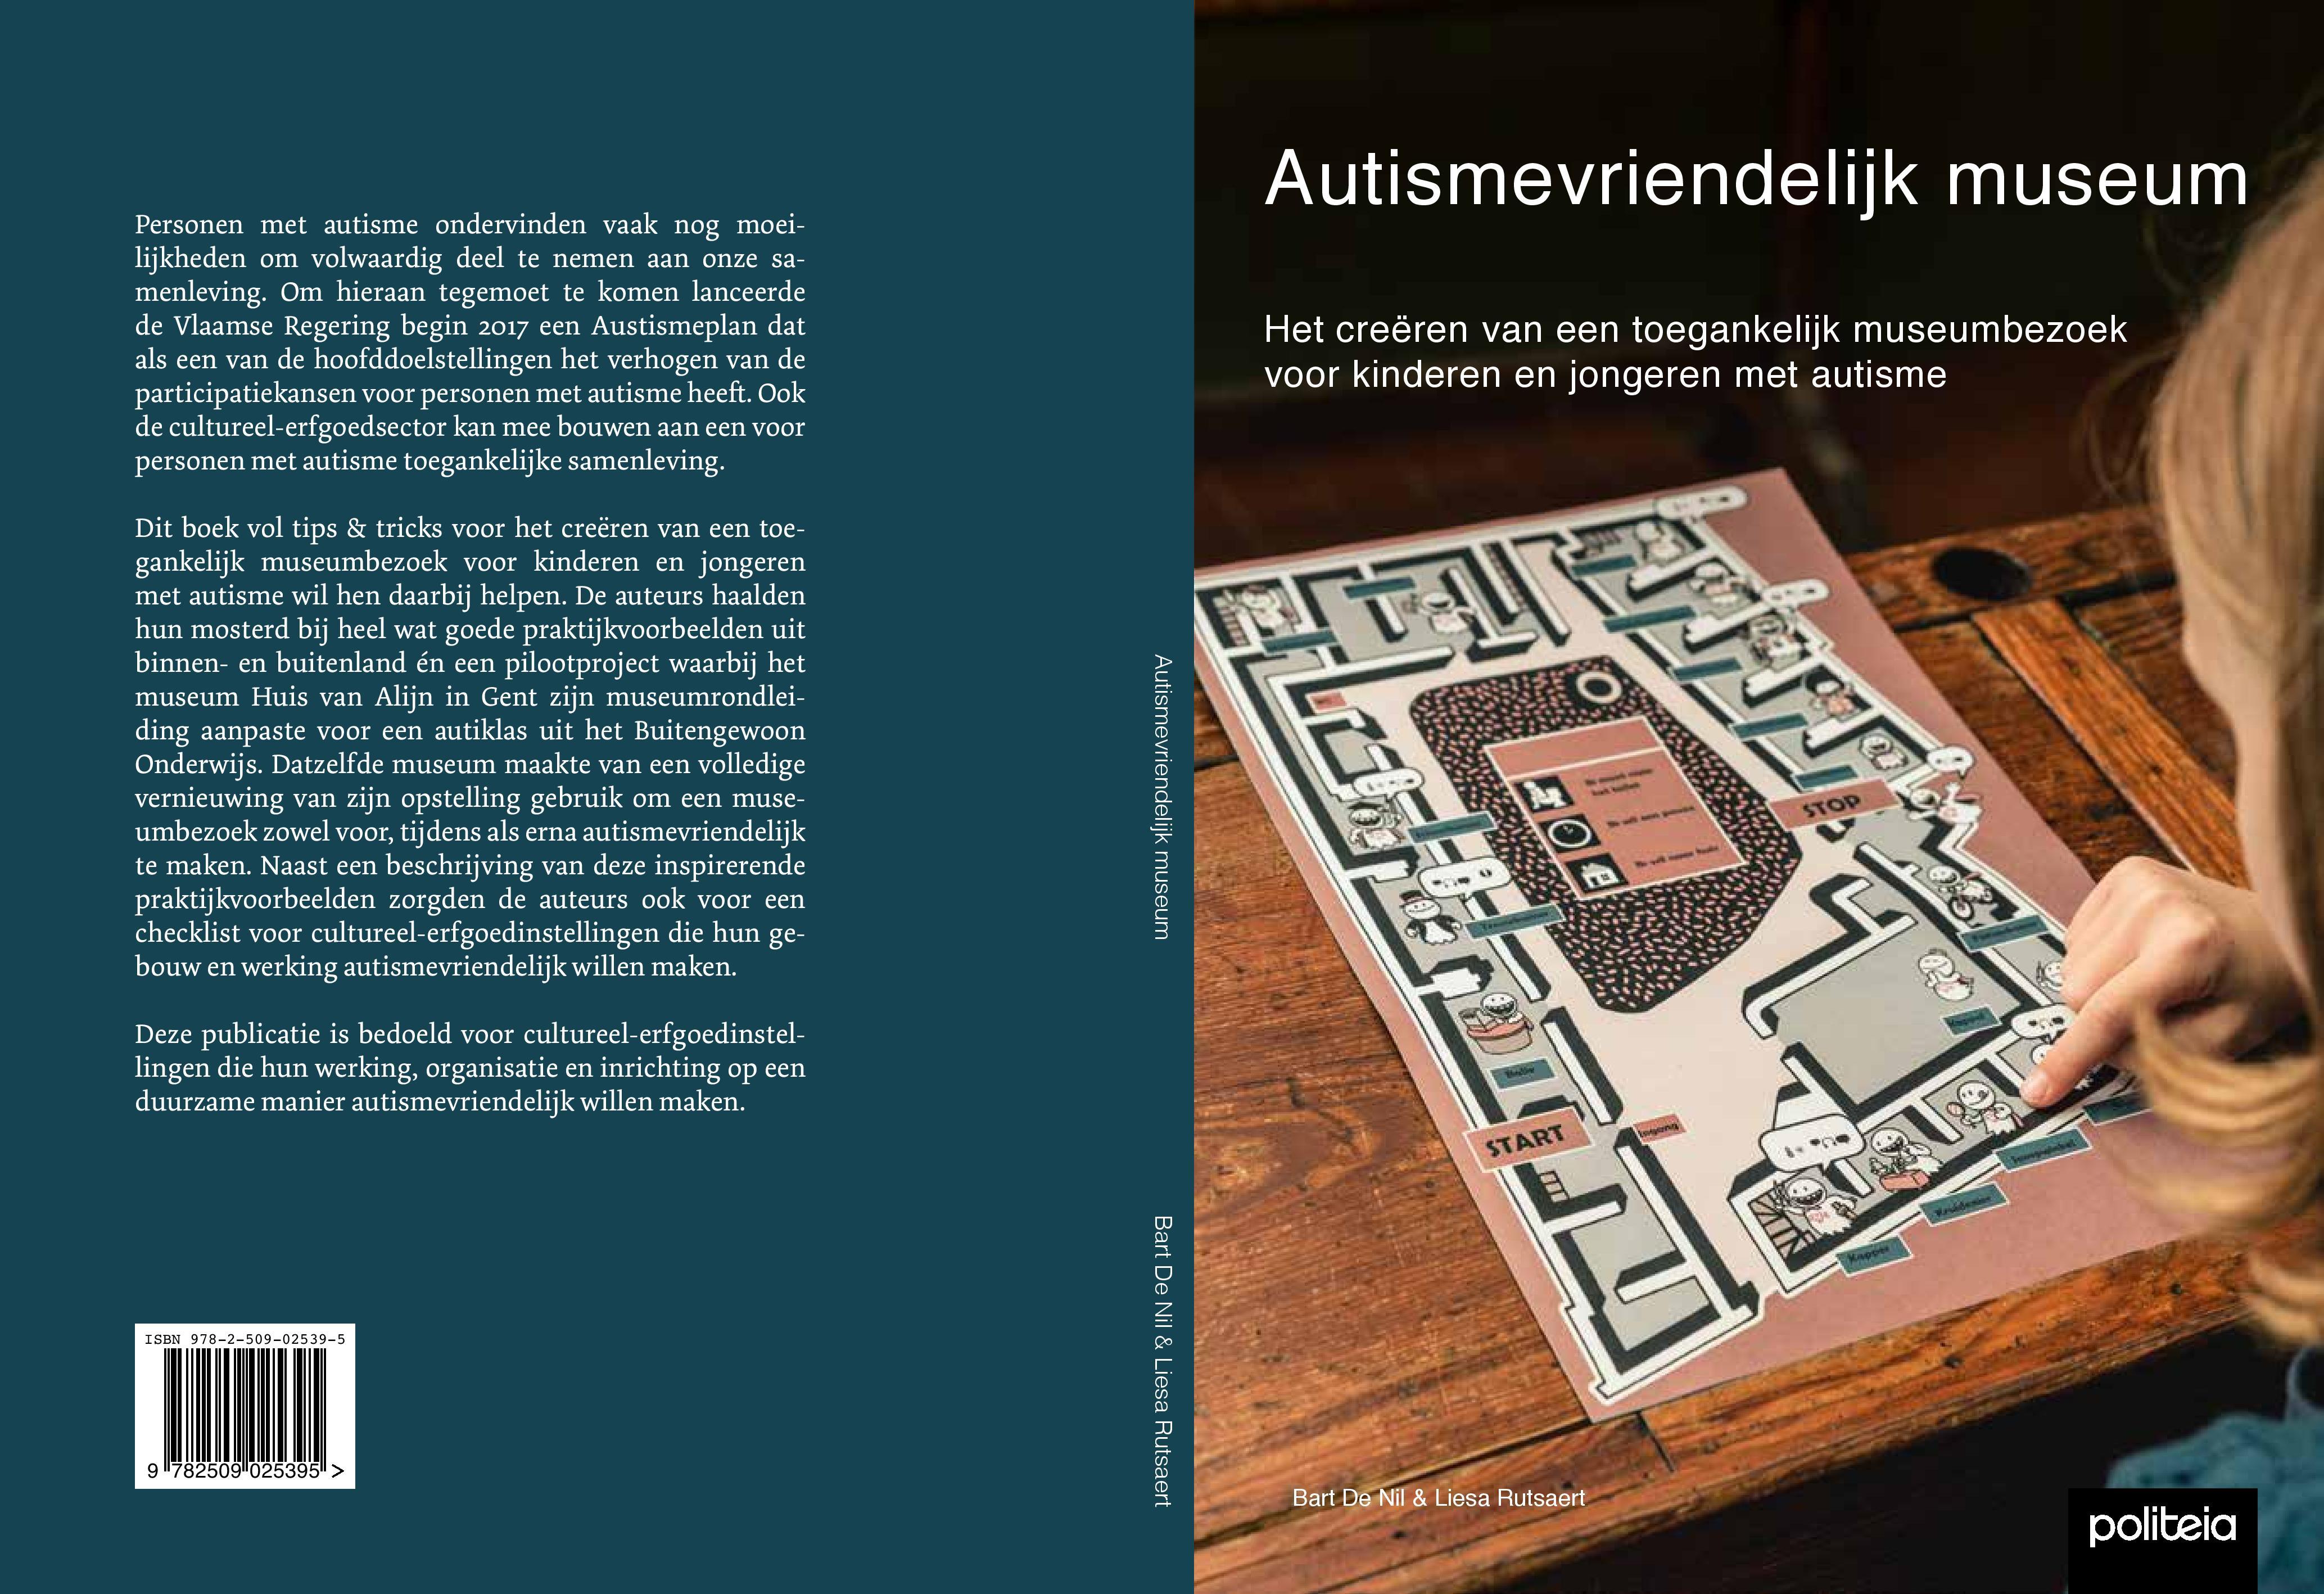 Autismevriendelijk museum_cover-page-001.jpg